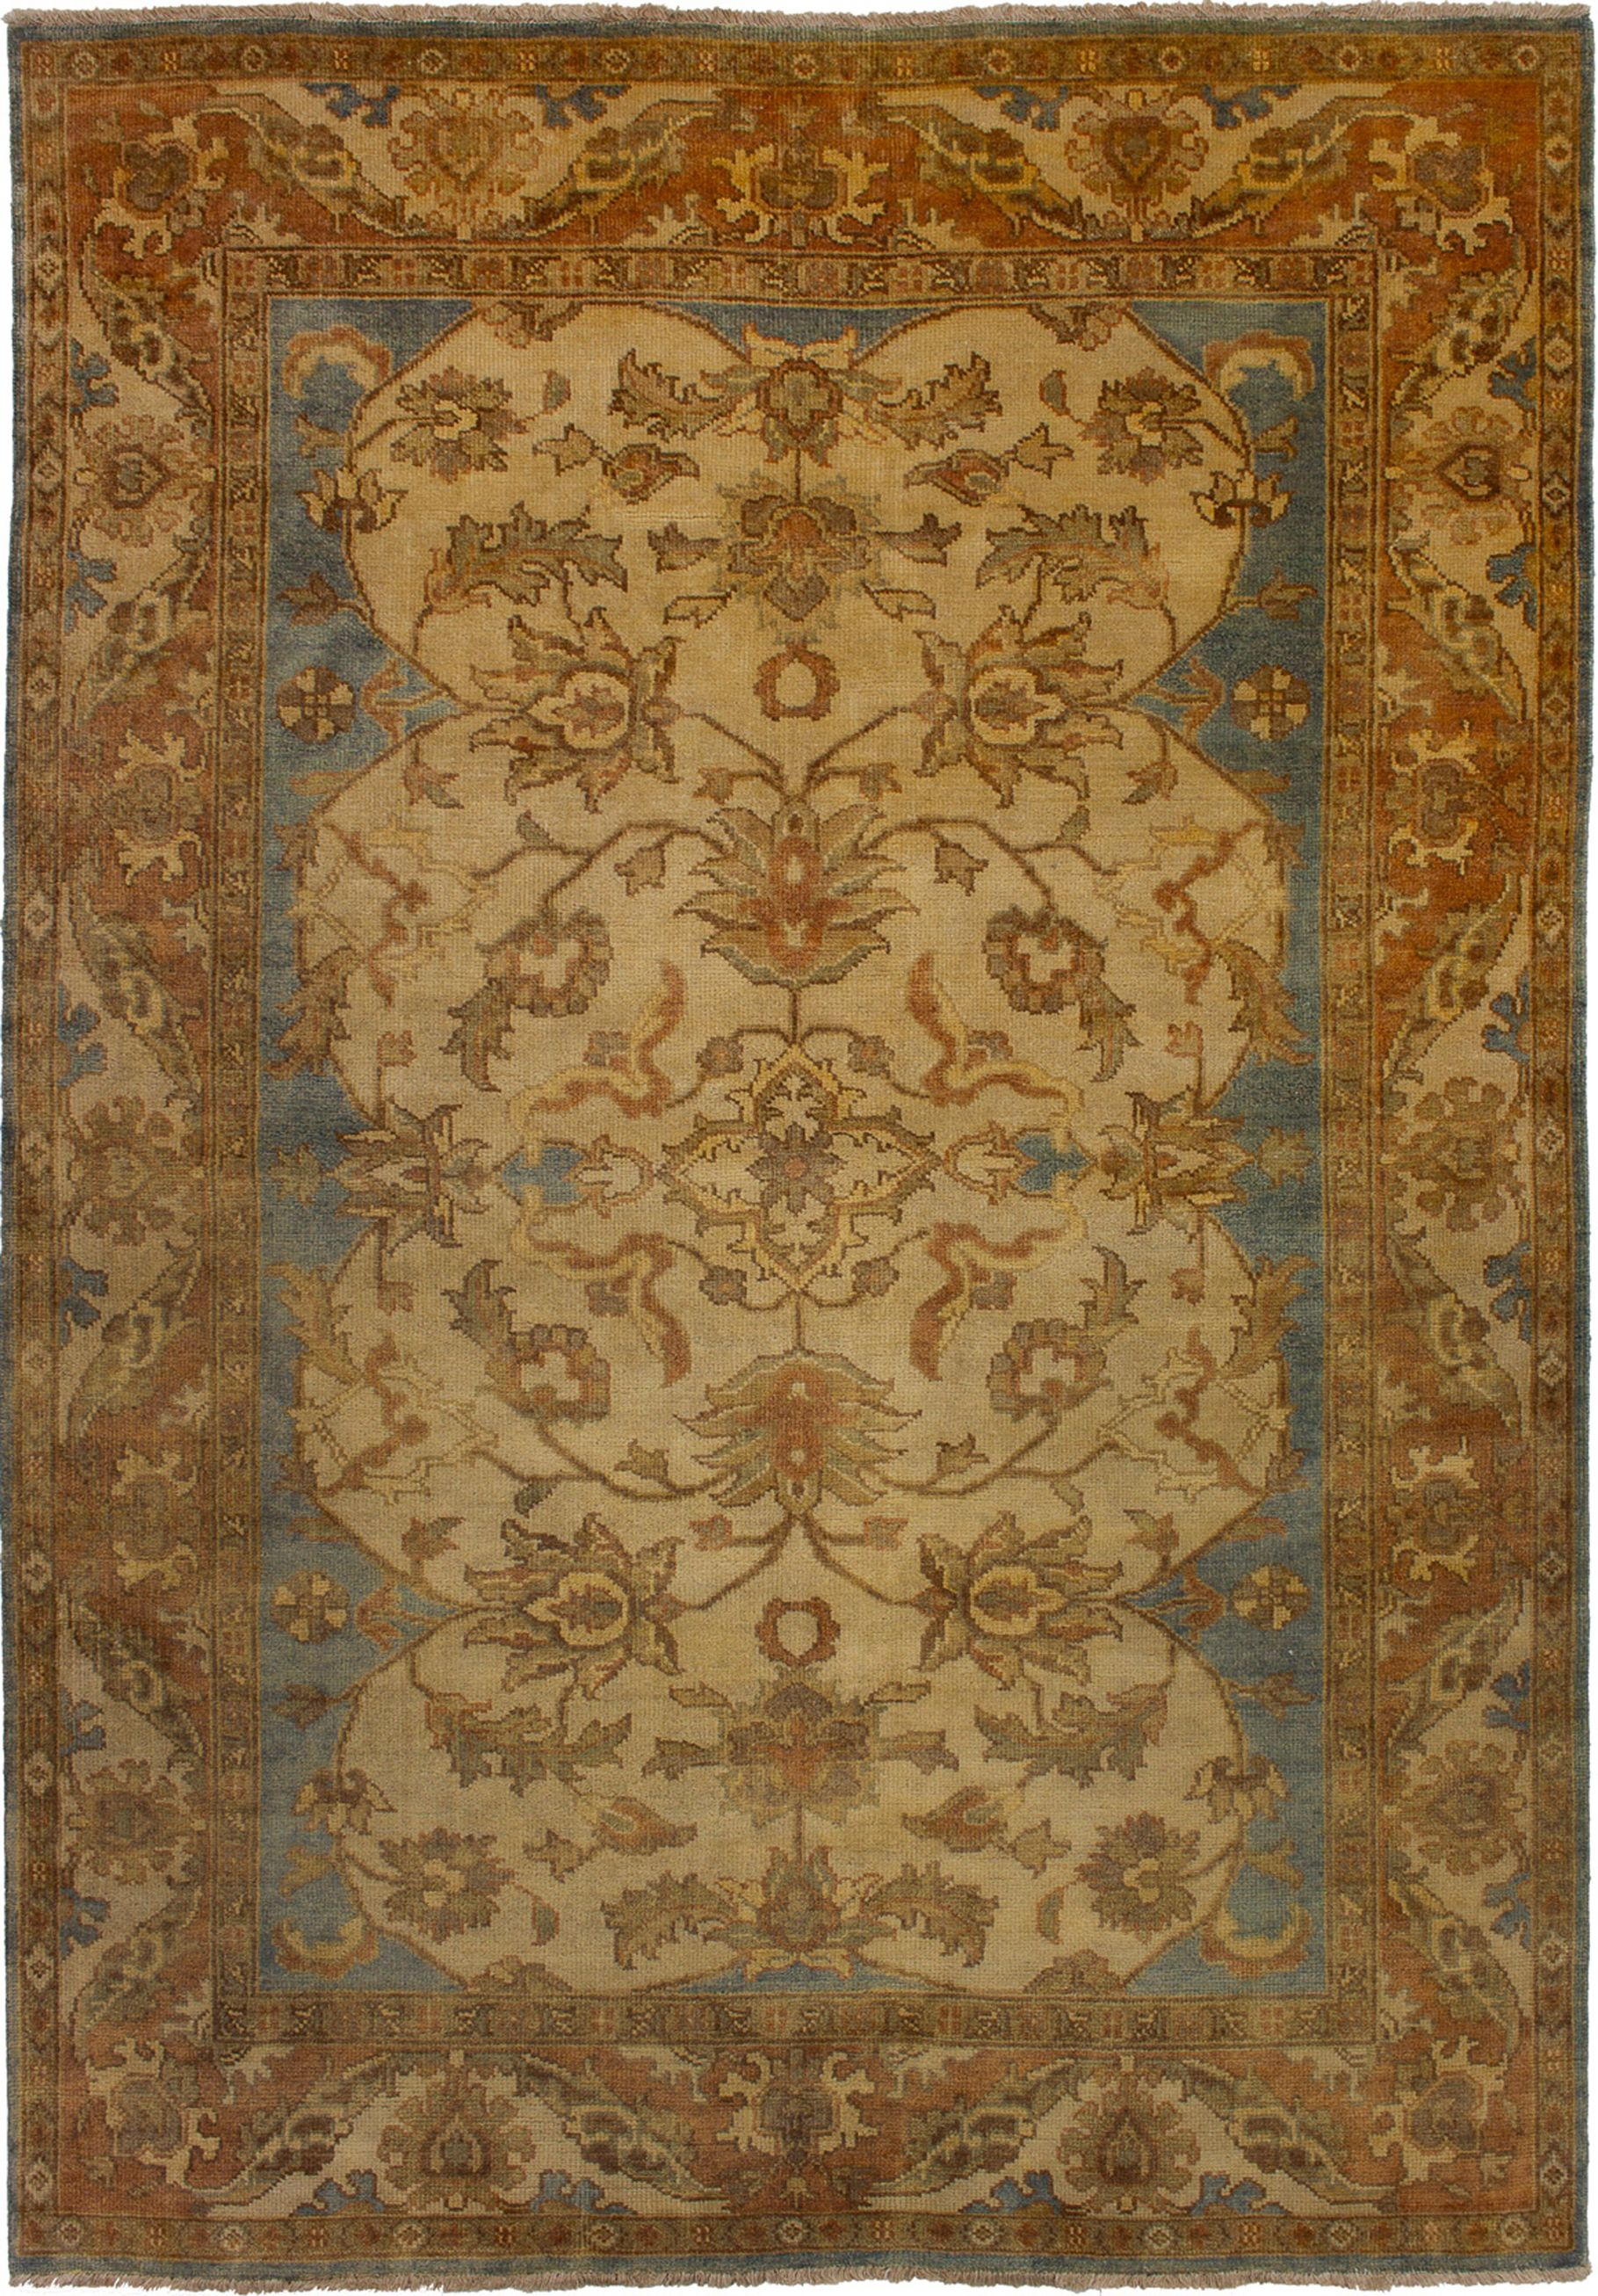 "Hand-knotted Royal Ushak Cream Wool Rug 6'1"" x 8'8""  Size: 6'1"" x 8'8"""